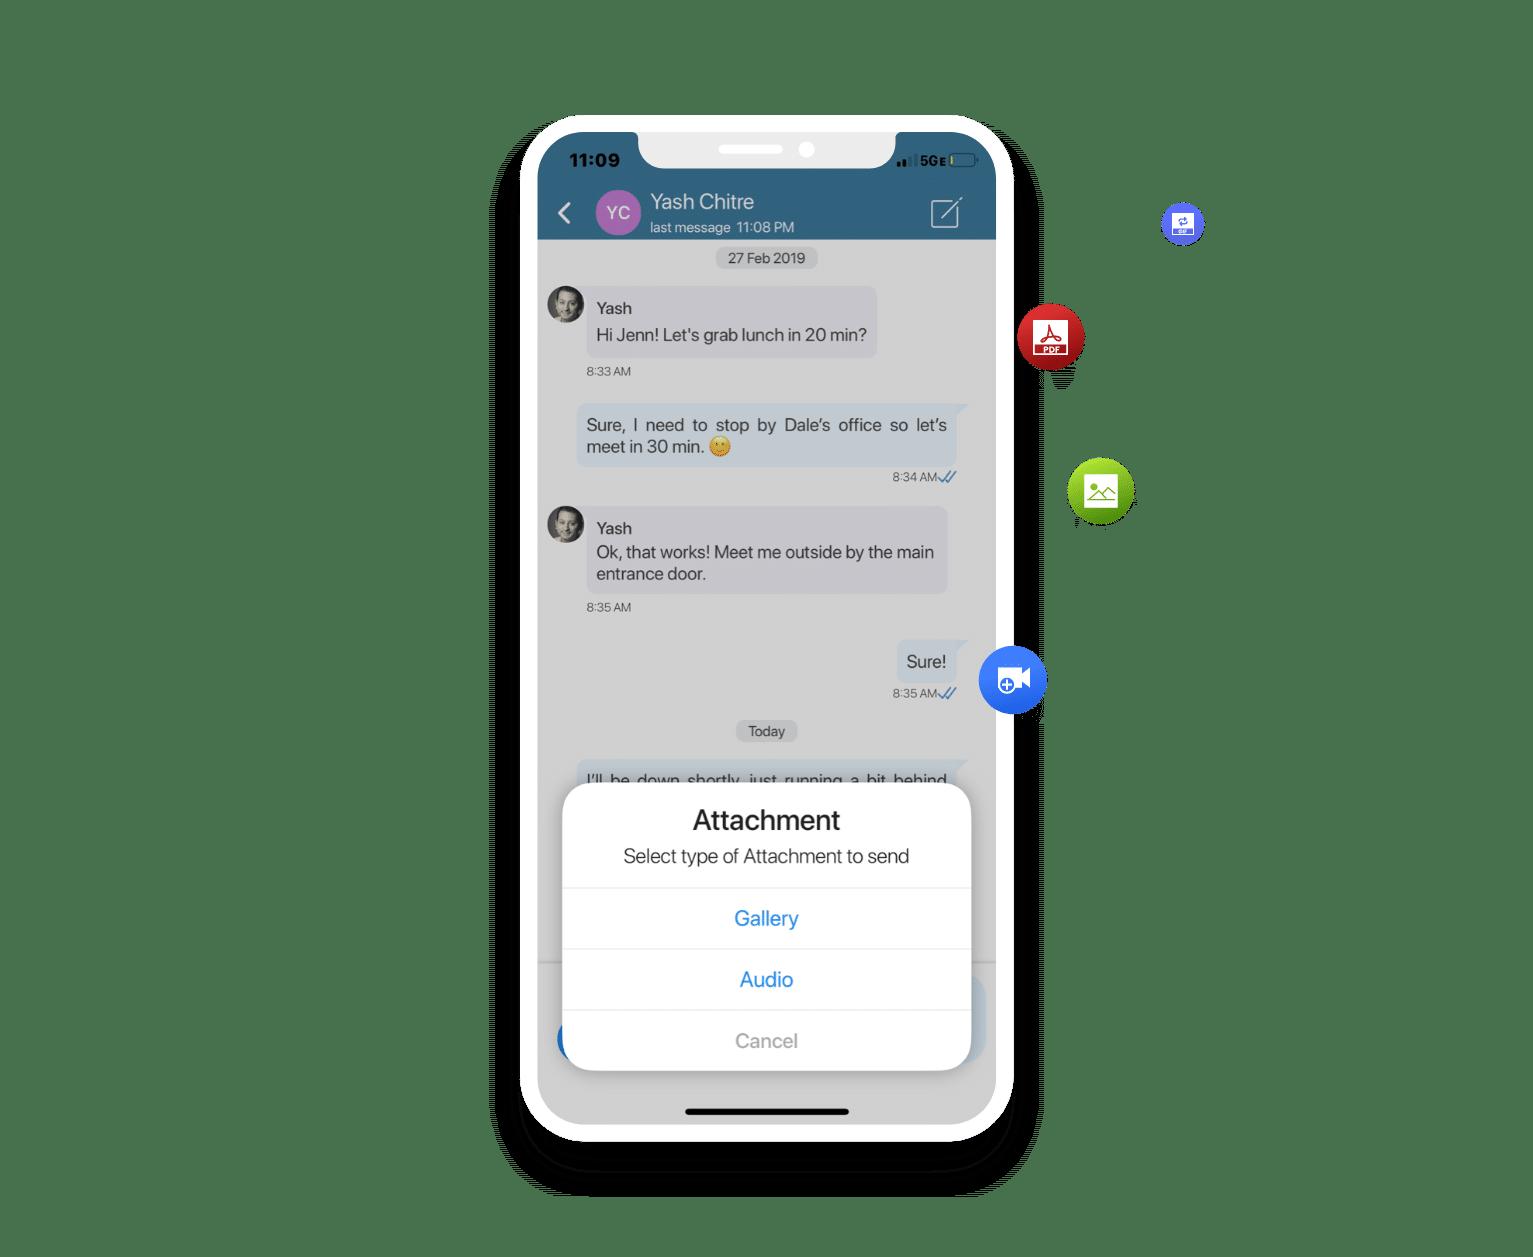 Full instant messaging capabilities